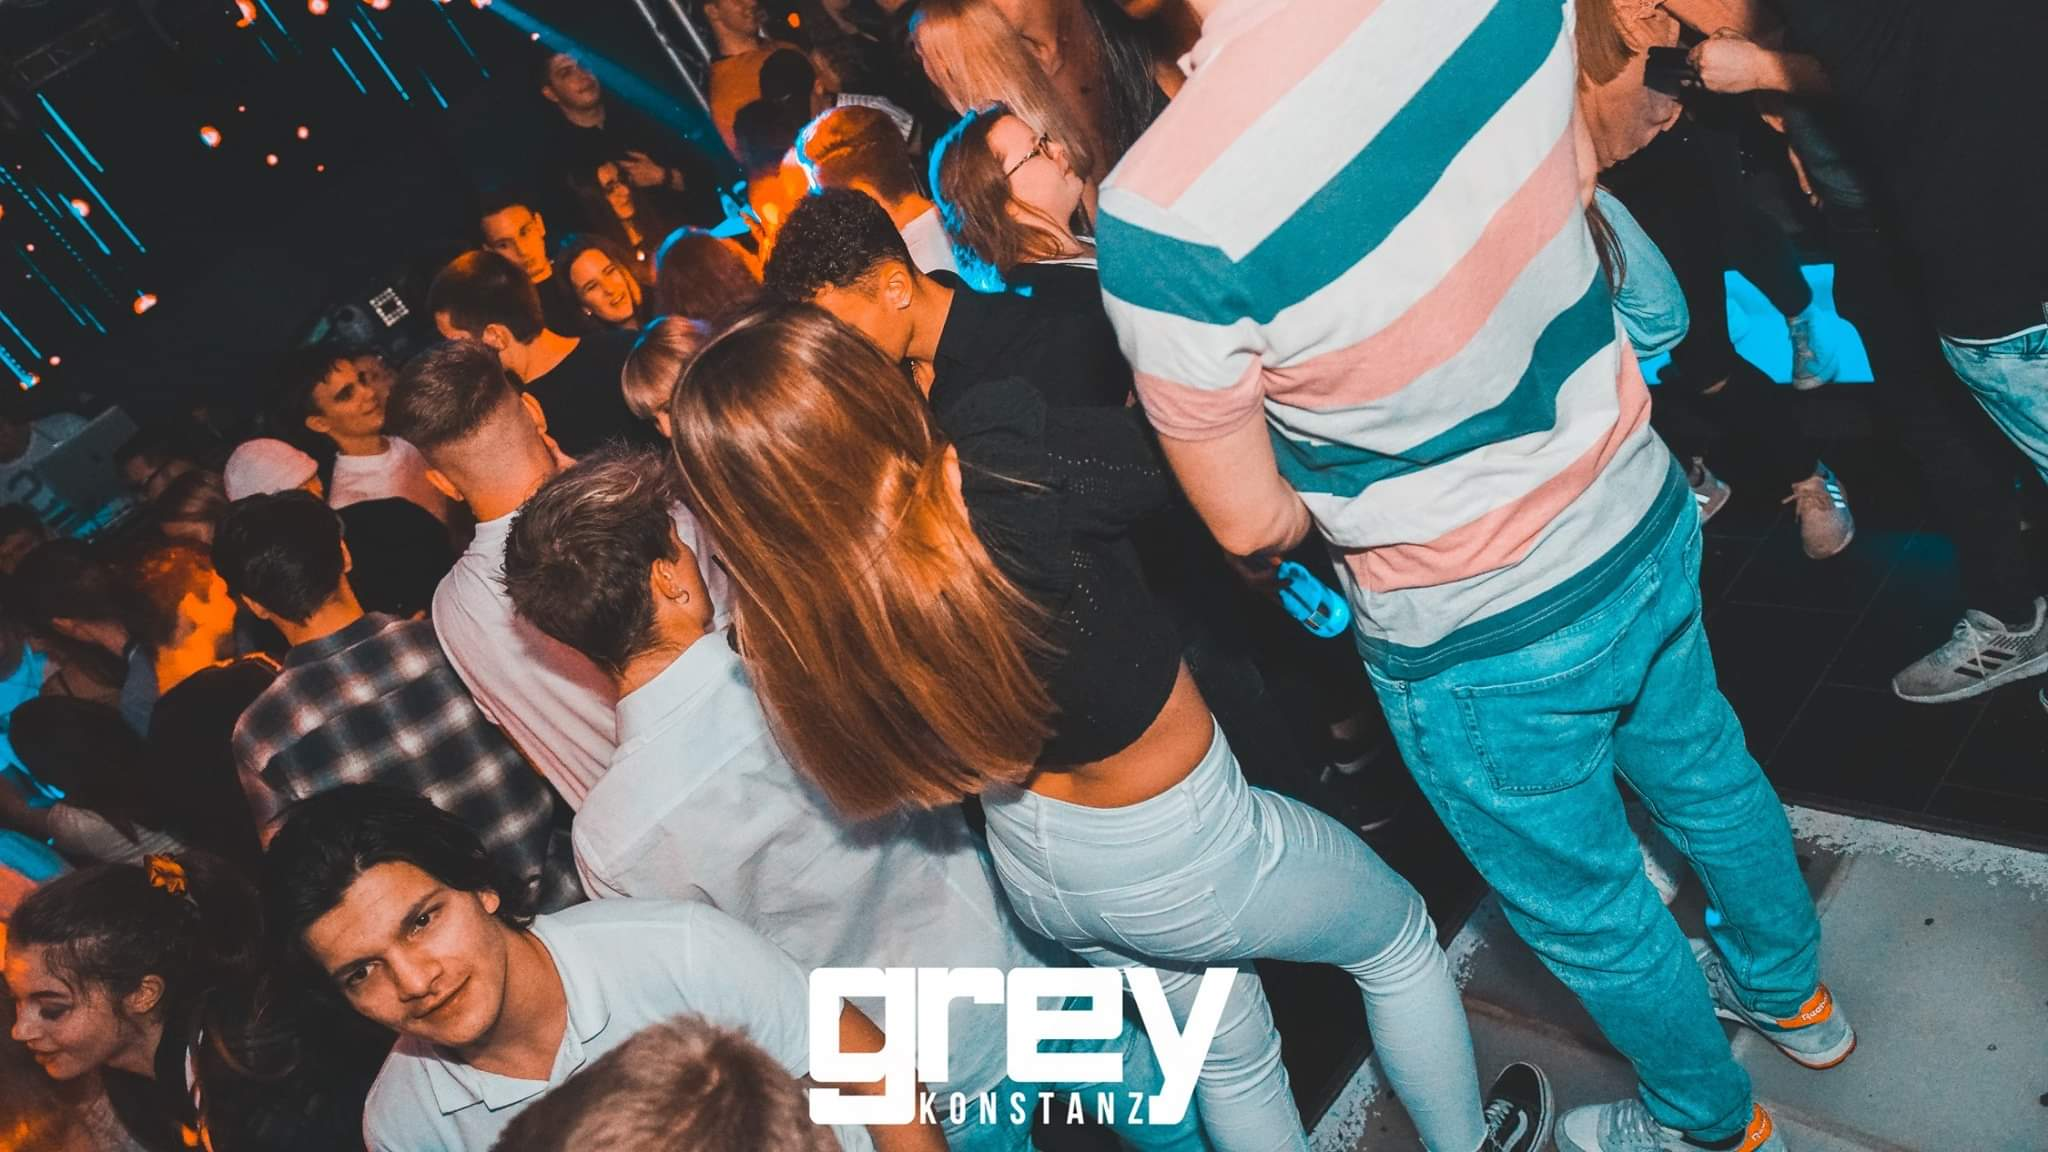 Nachtclub Konstanz